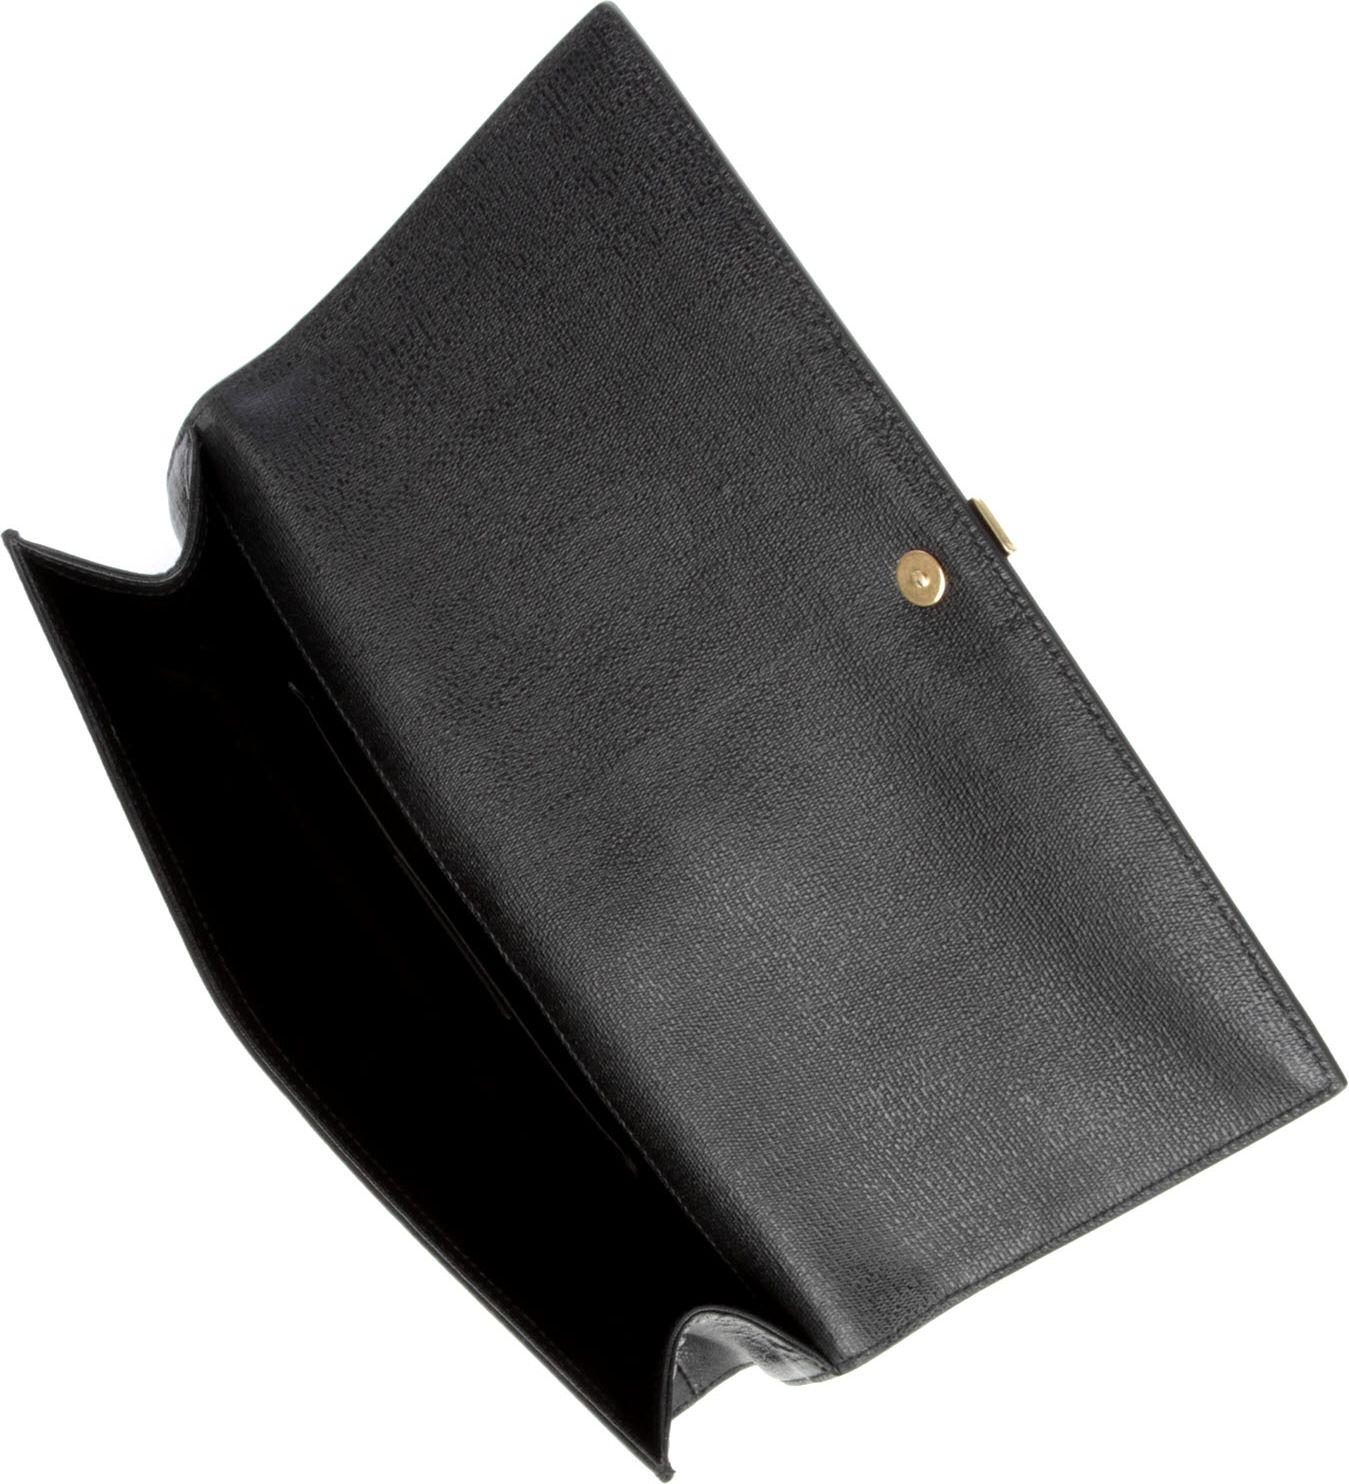 Saint laurent Chyc Mini Tweed Clutch in Black (noir) | Lyst